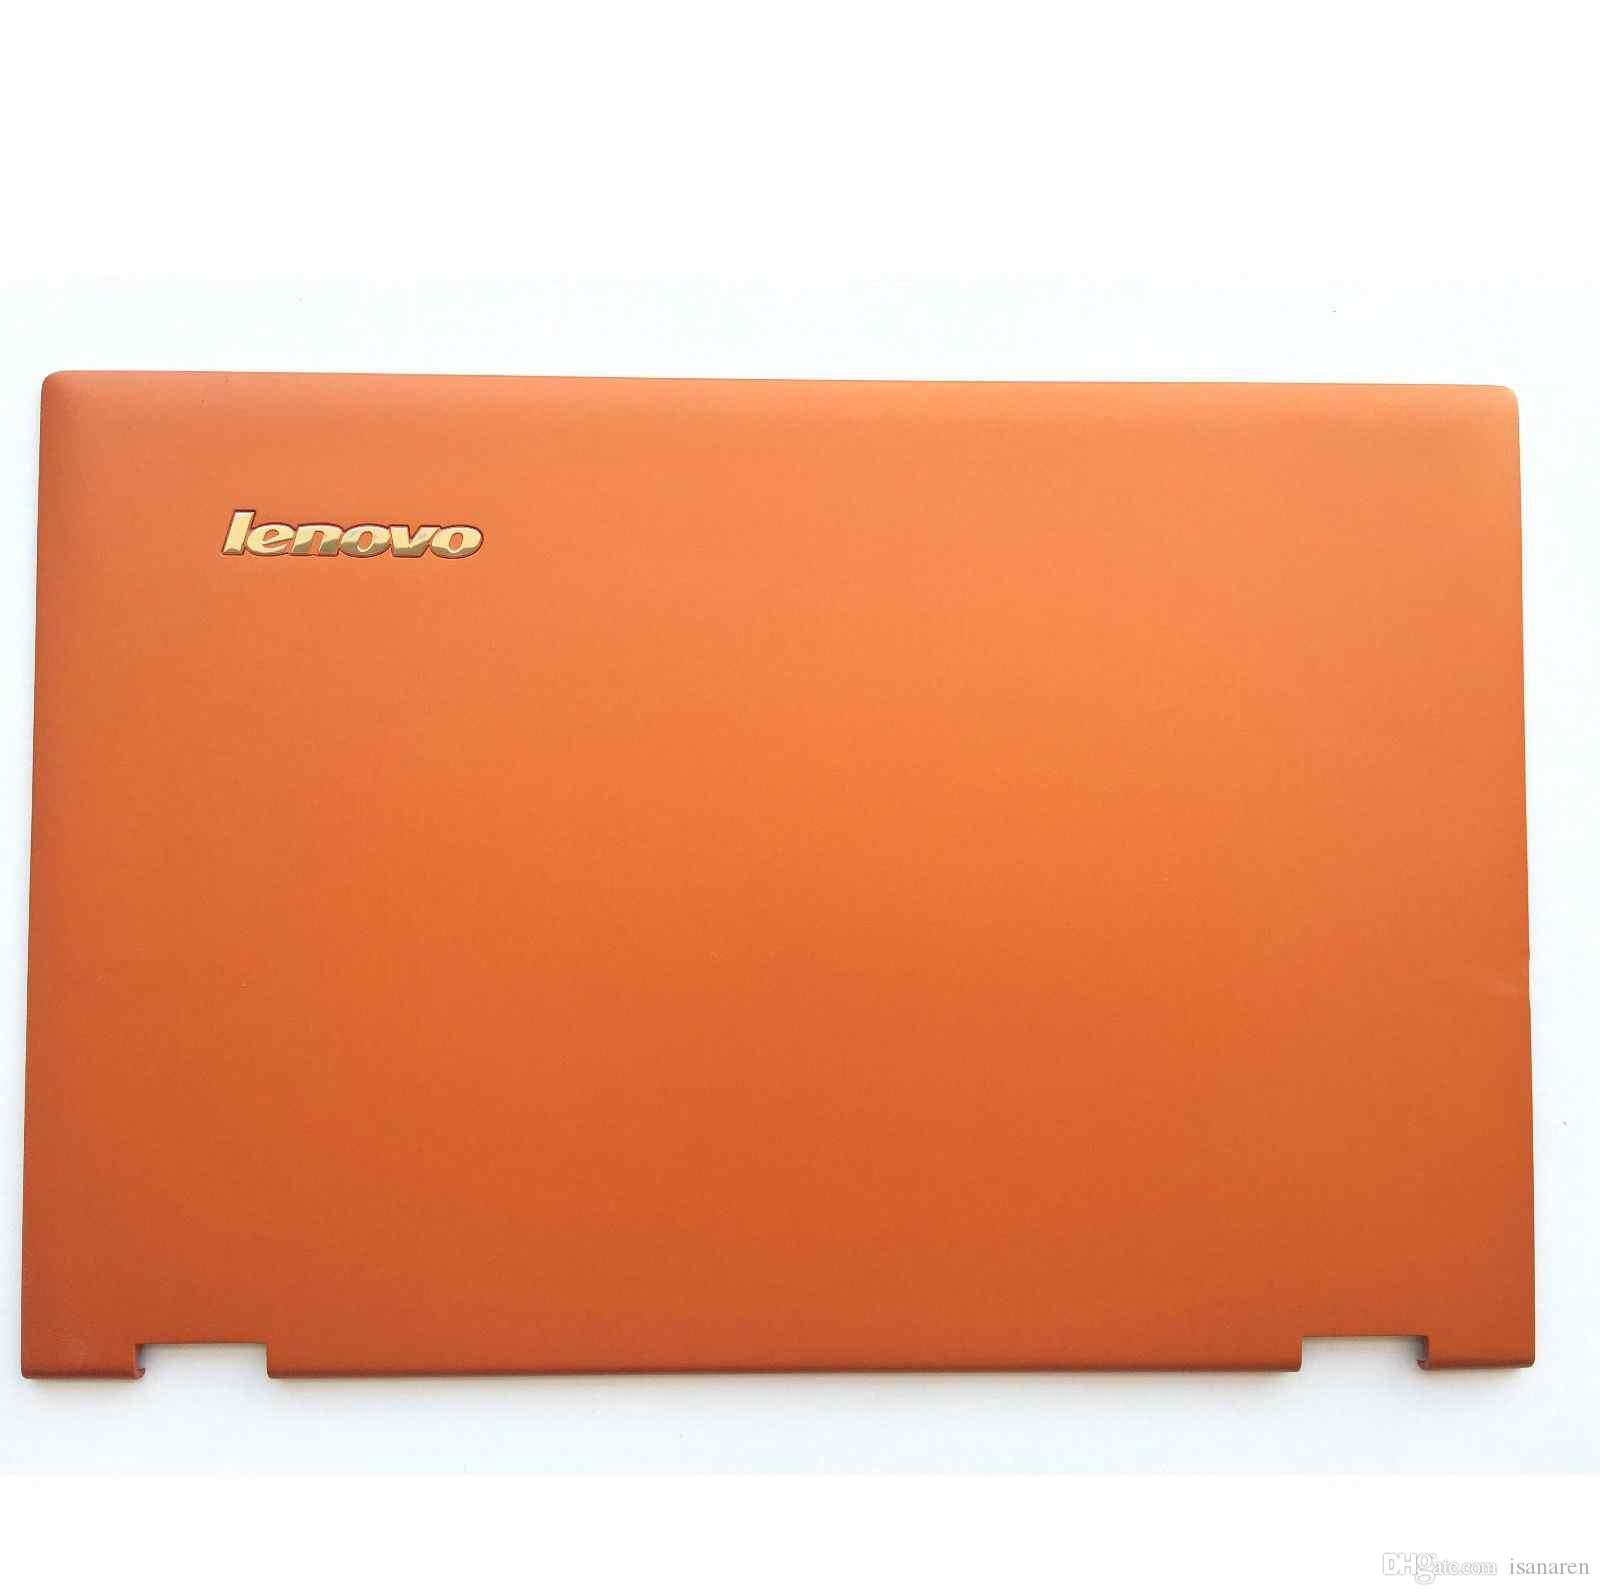 New Original Lenovo Yoga 2 Pro 13 Base Cover Laptop Bottom Orange AM0S9000200